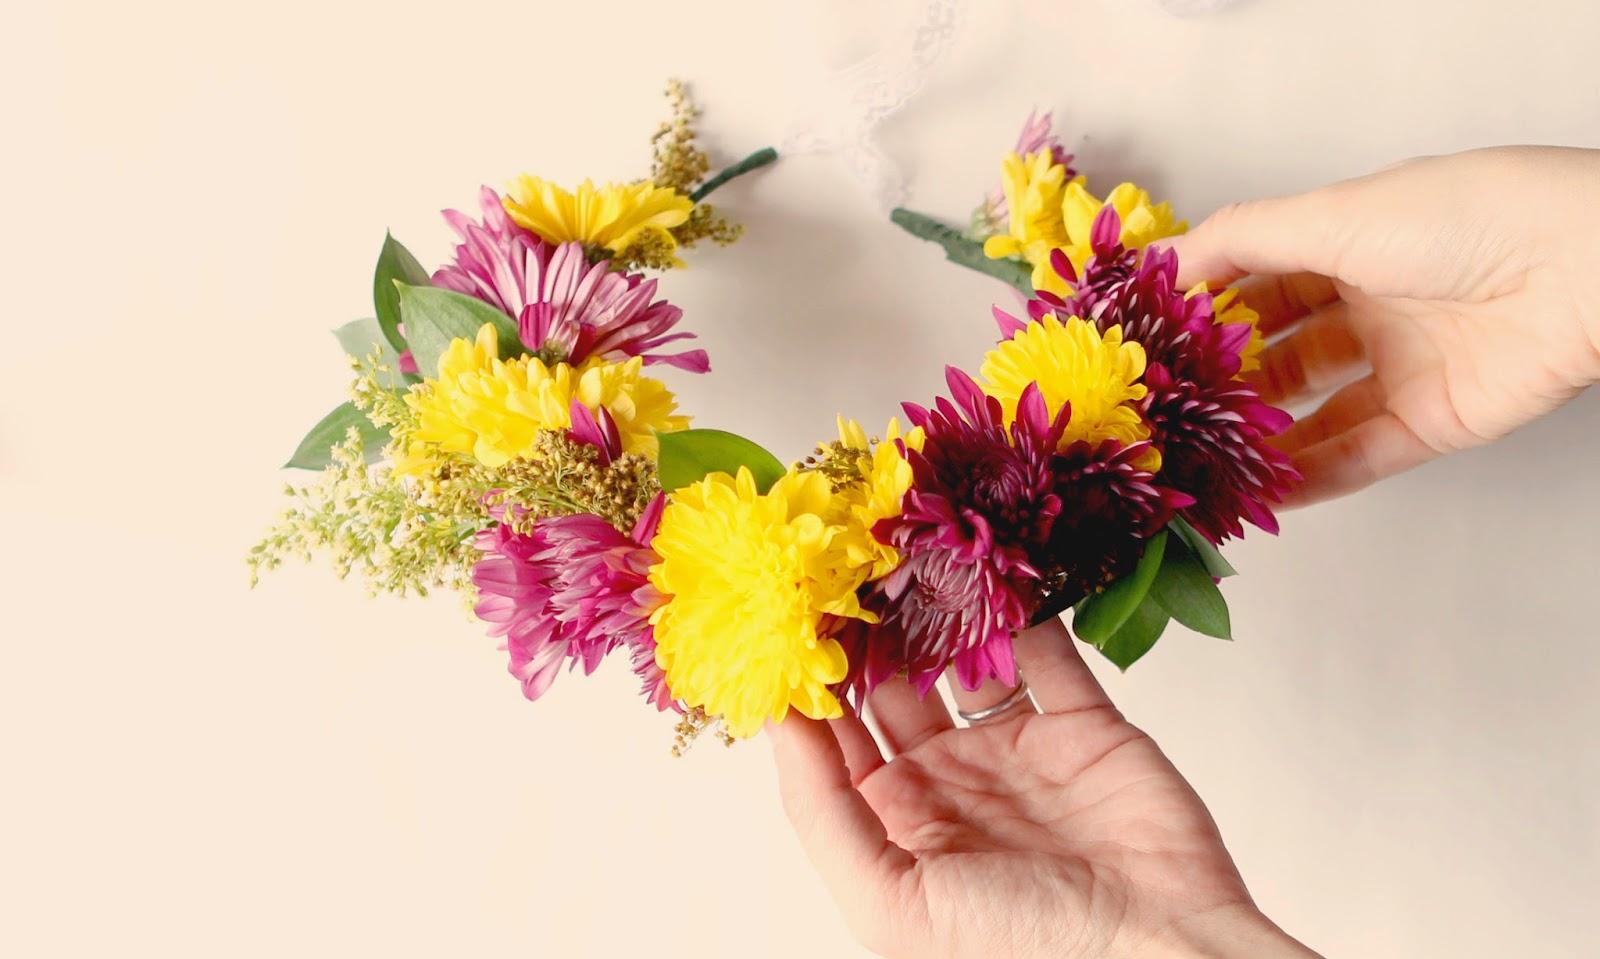 Flower crown overlay flower crown overlay photo23 izmirmasajfo